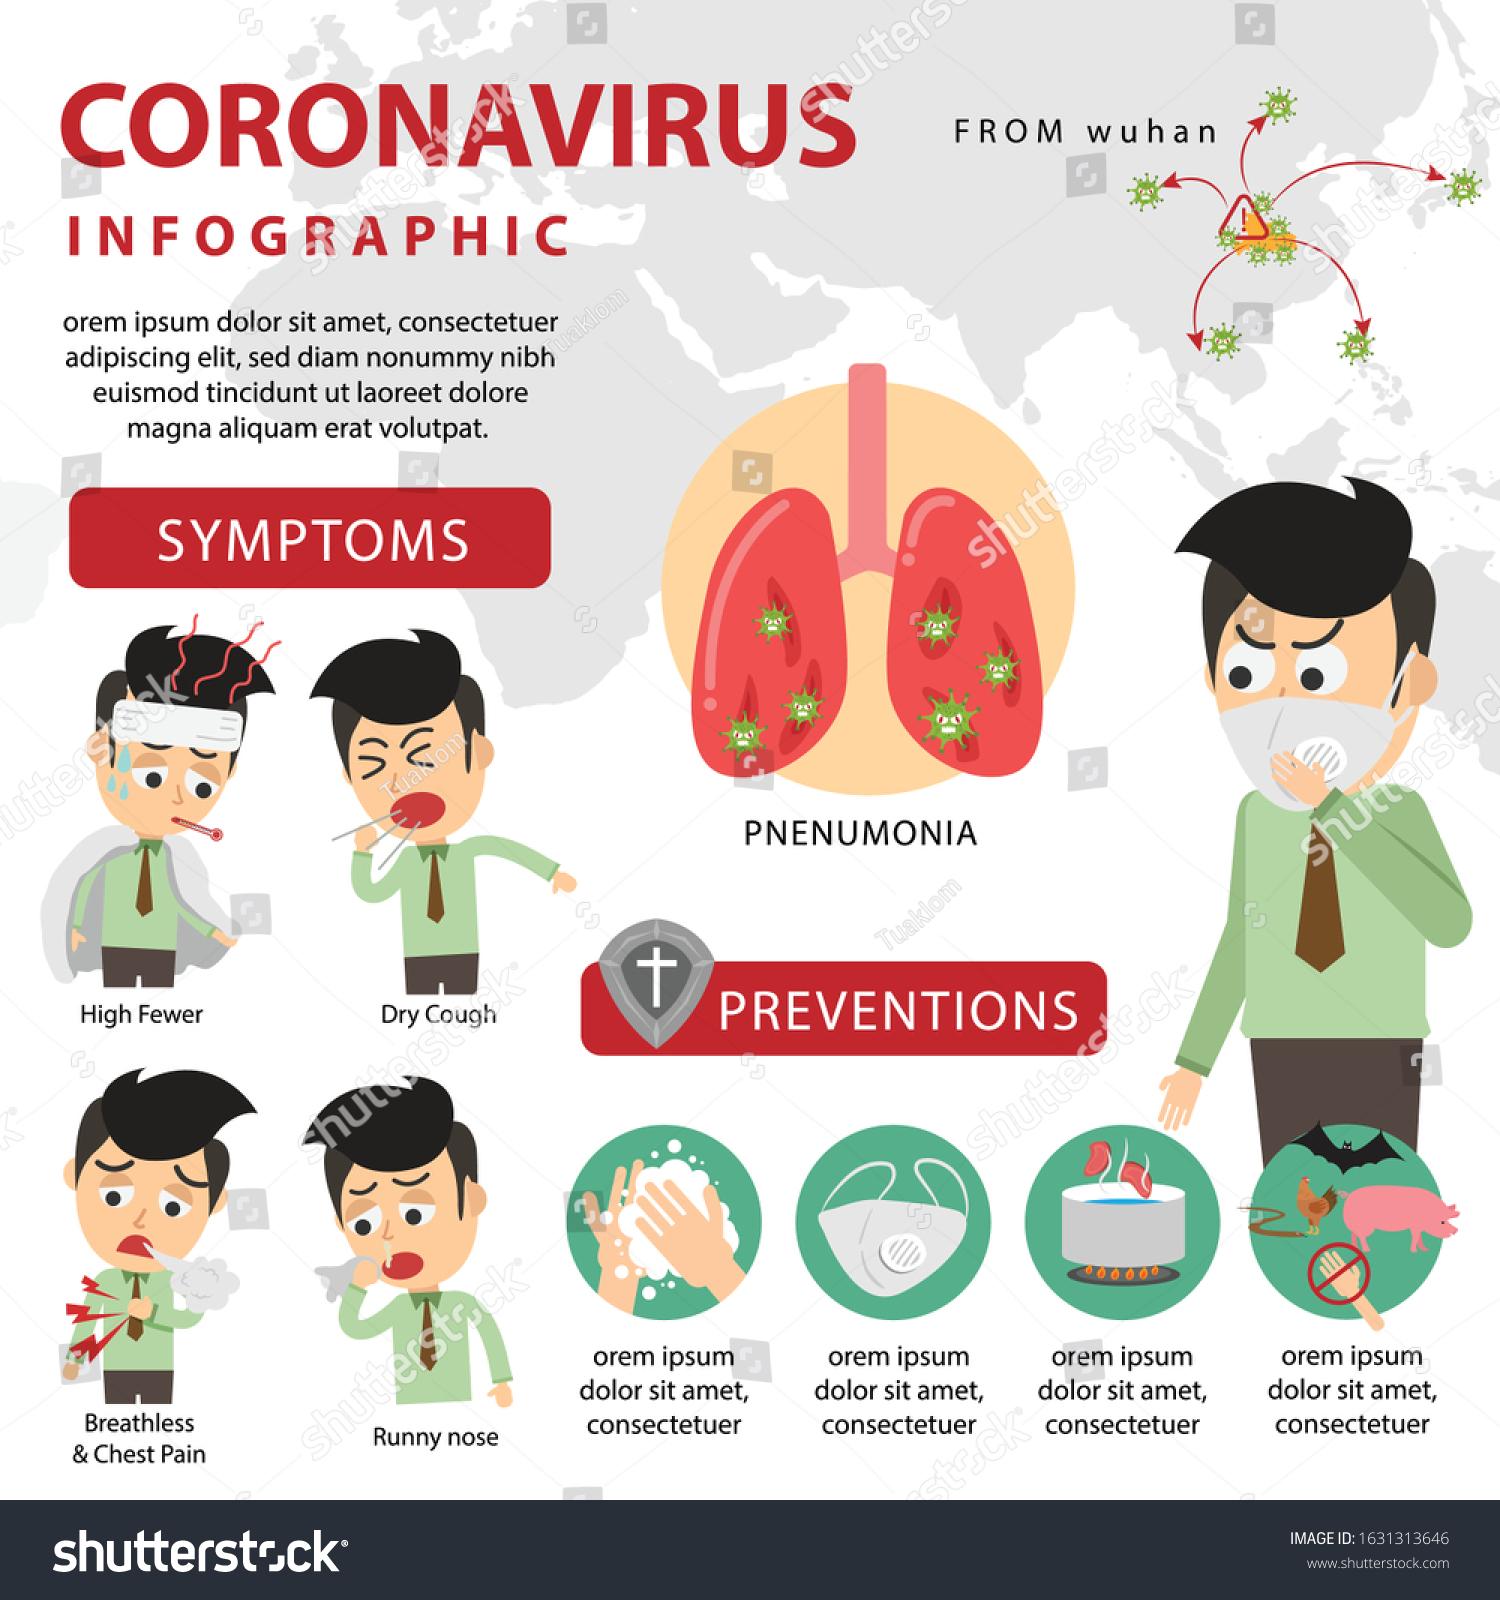 Corona Virus Images, Stock Photos & Vectors | Shutterstock